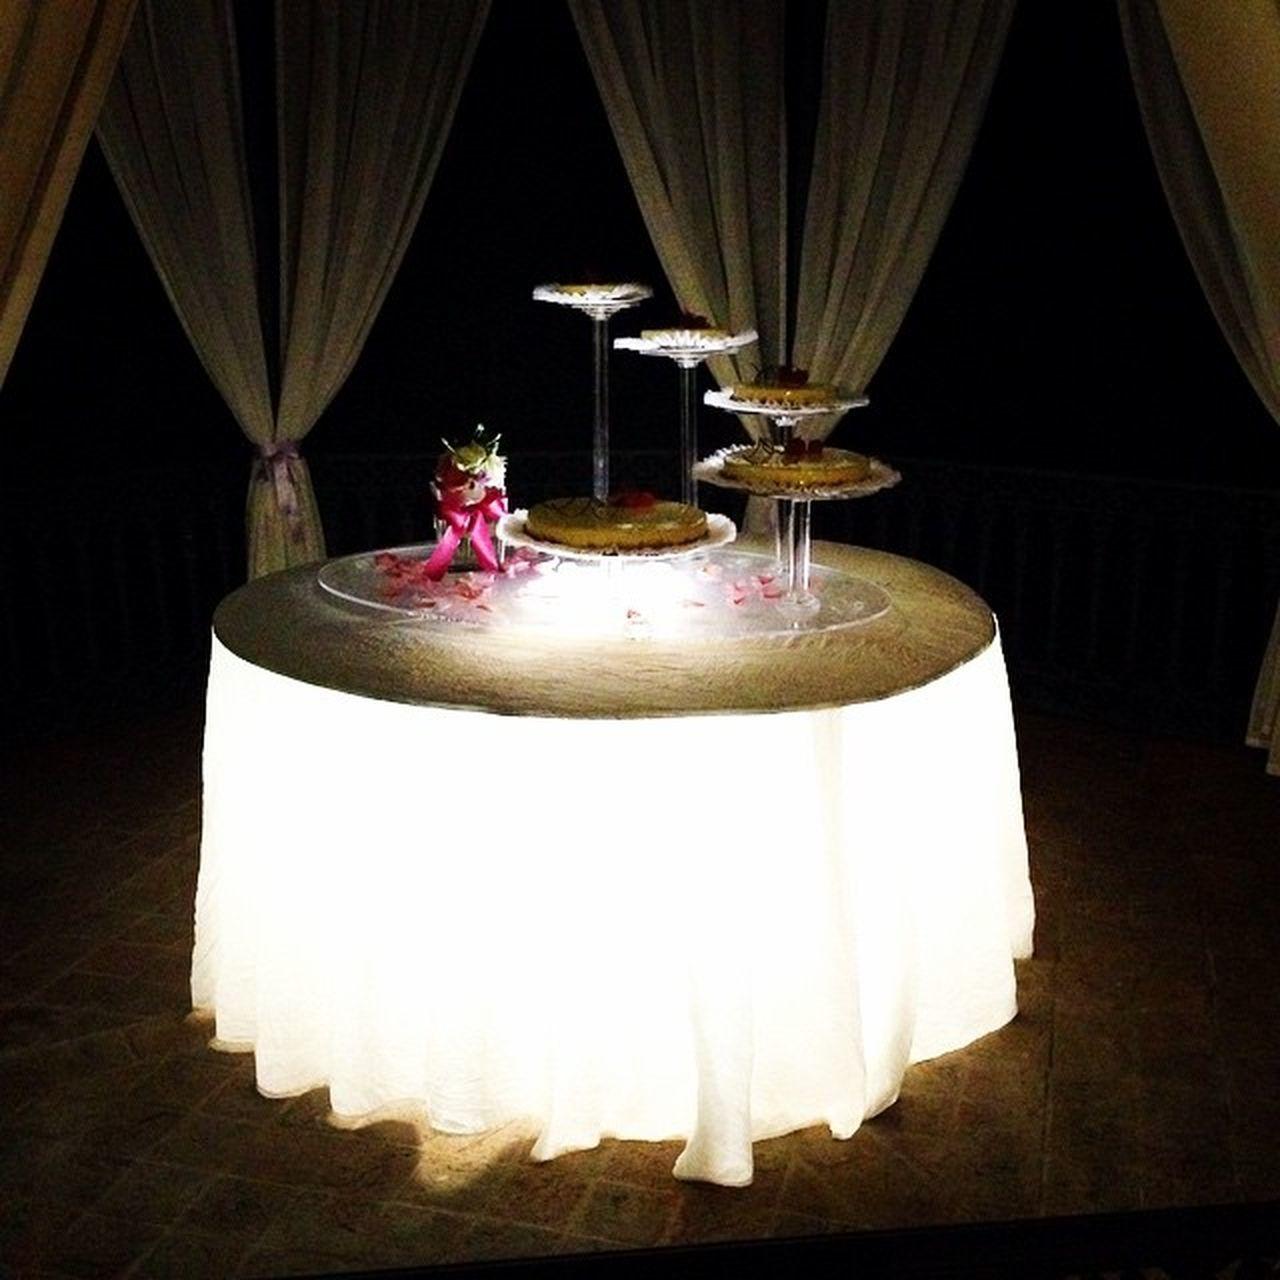 Torta Weddingcake Matrimonioinlilla Evvivaglisposi Cinziavogliamoidolci